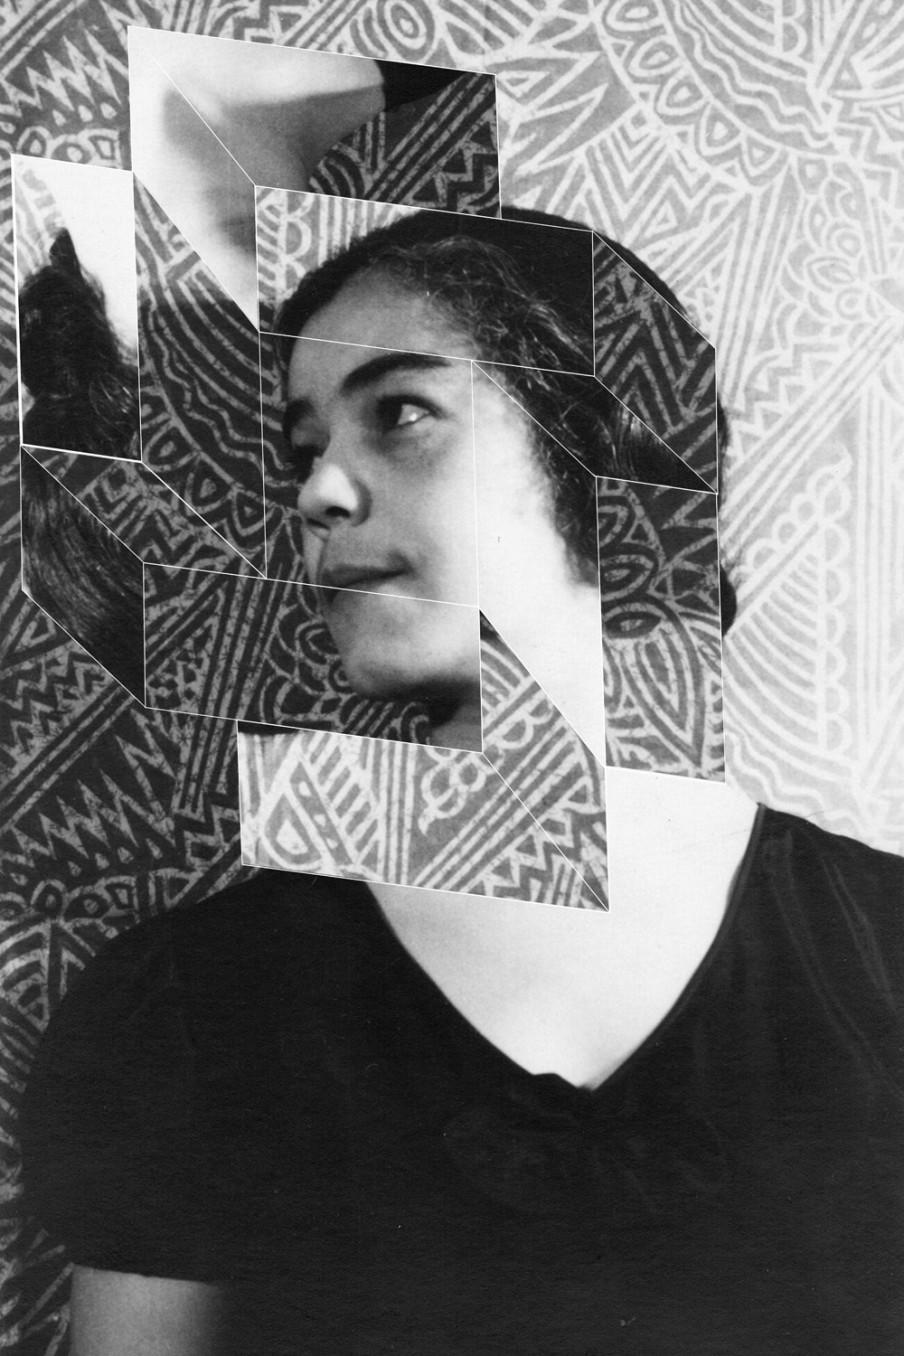 Andrea Geyer, Constellations Dorothy Peterson After Vanvechten, 2018, Hand Cut Archival Print On Rag Paper, 86.4 X 58.4 cm